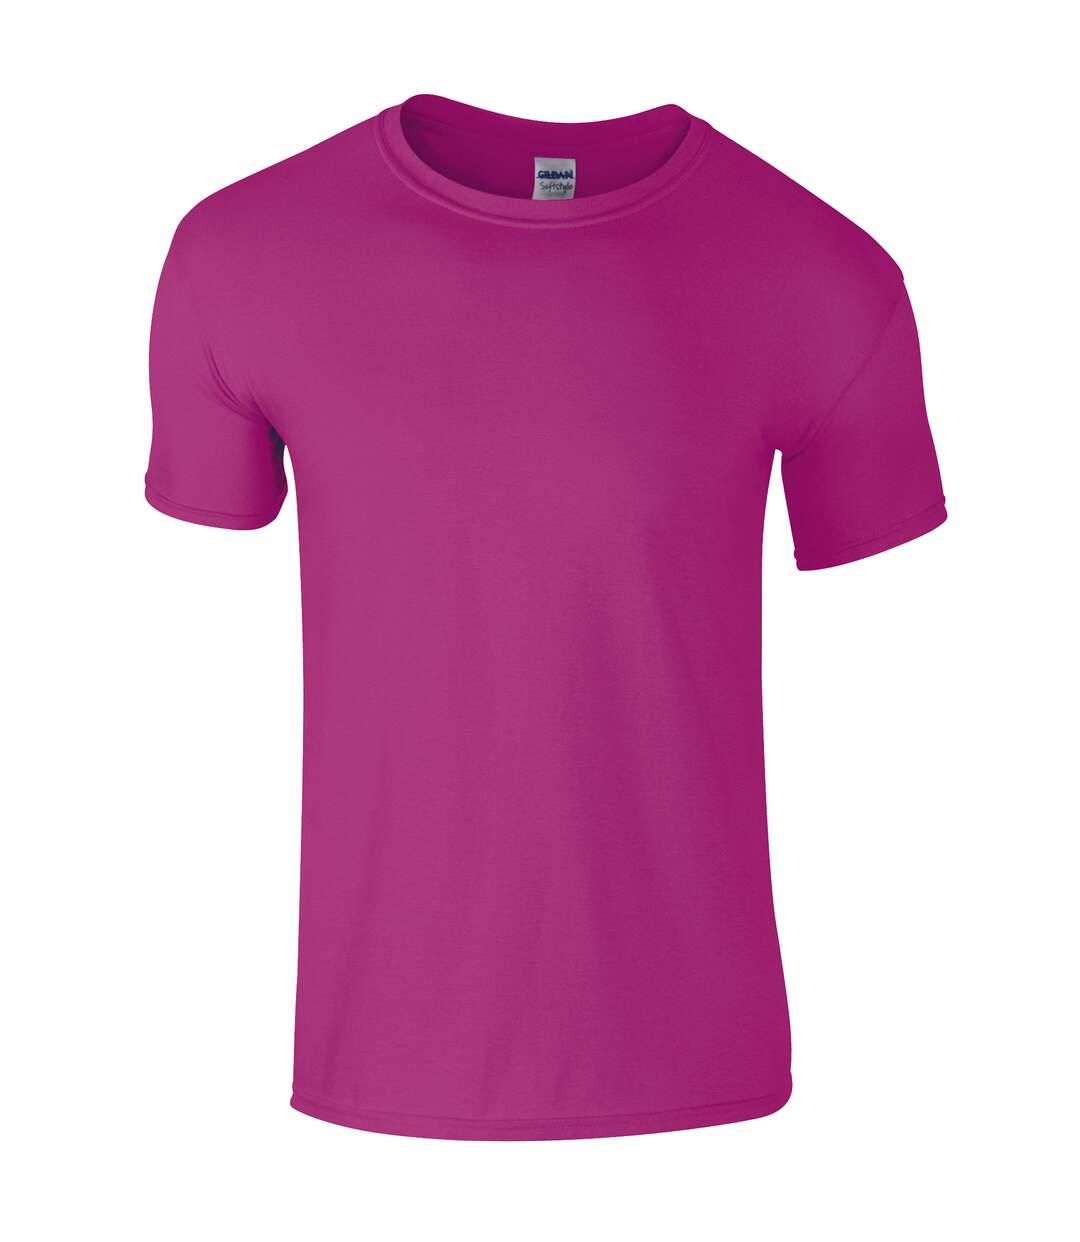 Gildan Mens Short Sleeve Soft-Style T-Shirt (Antique Heliconia) - UTBC484